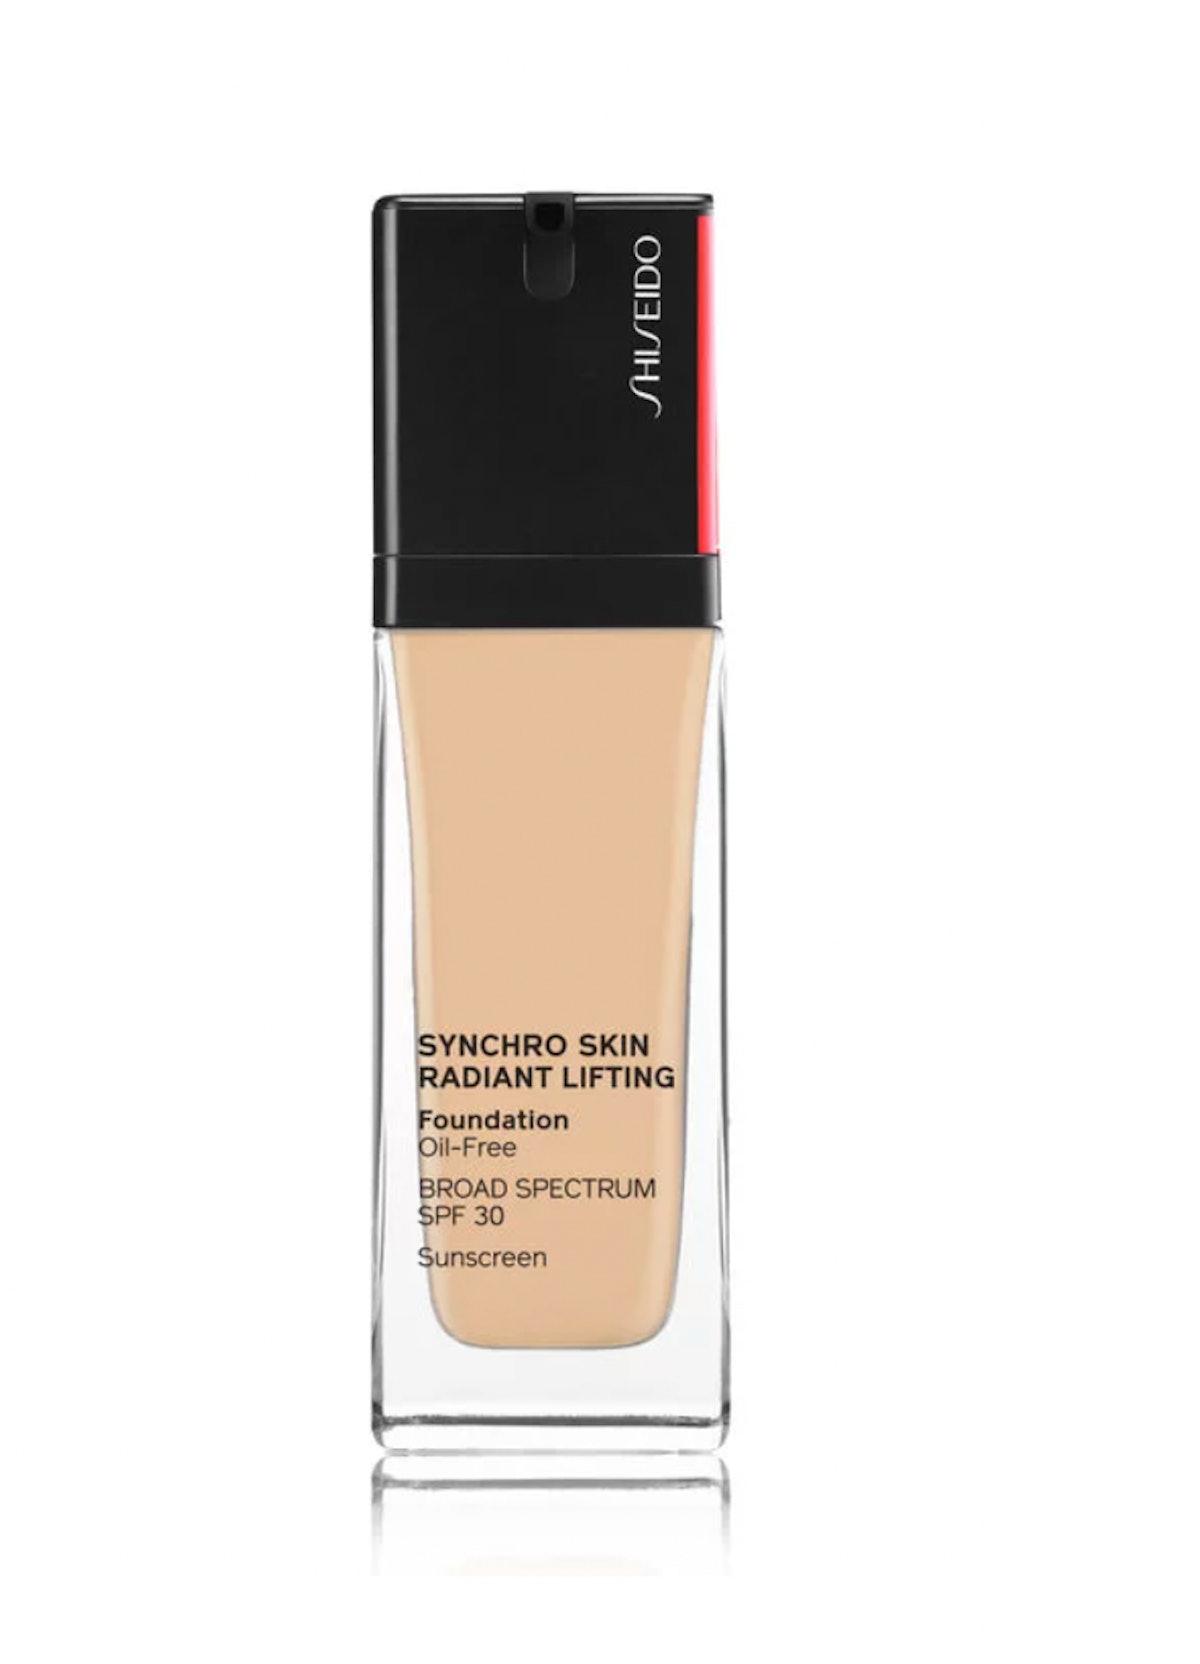 Synchro Skin Radiant Lifting Foundation